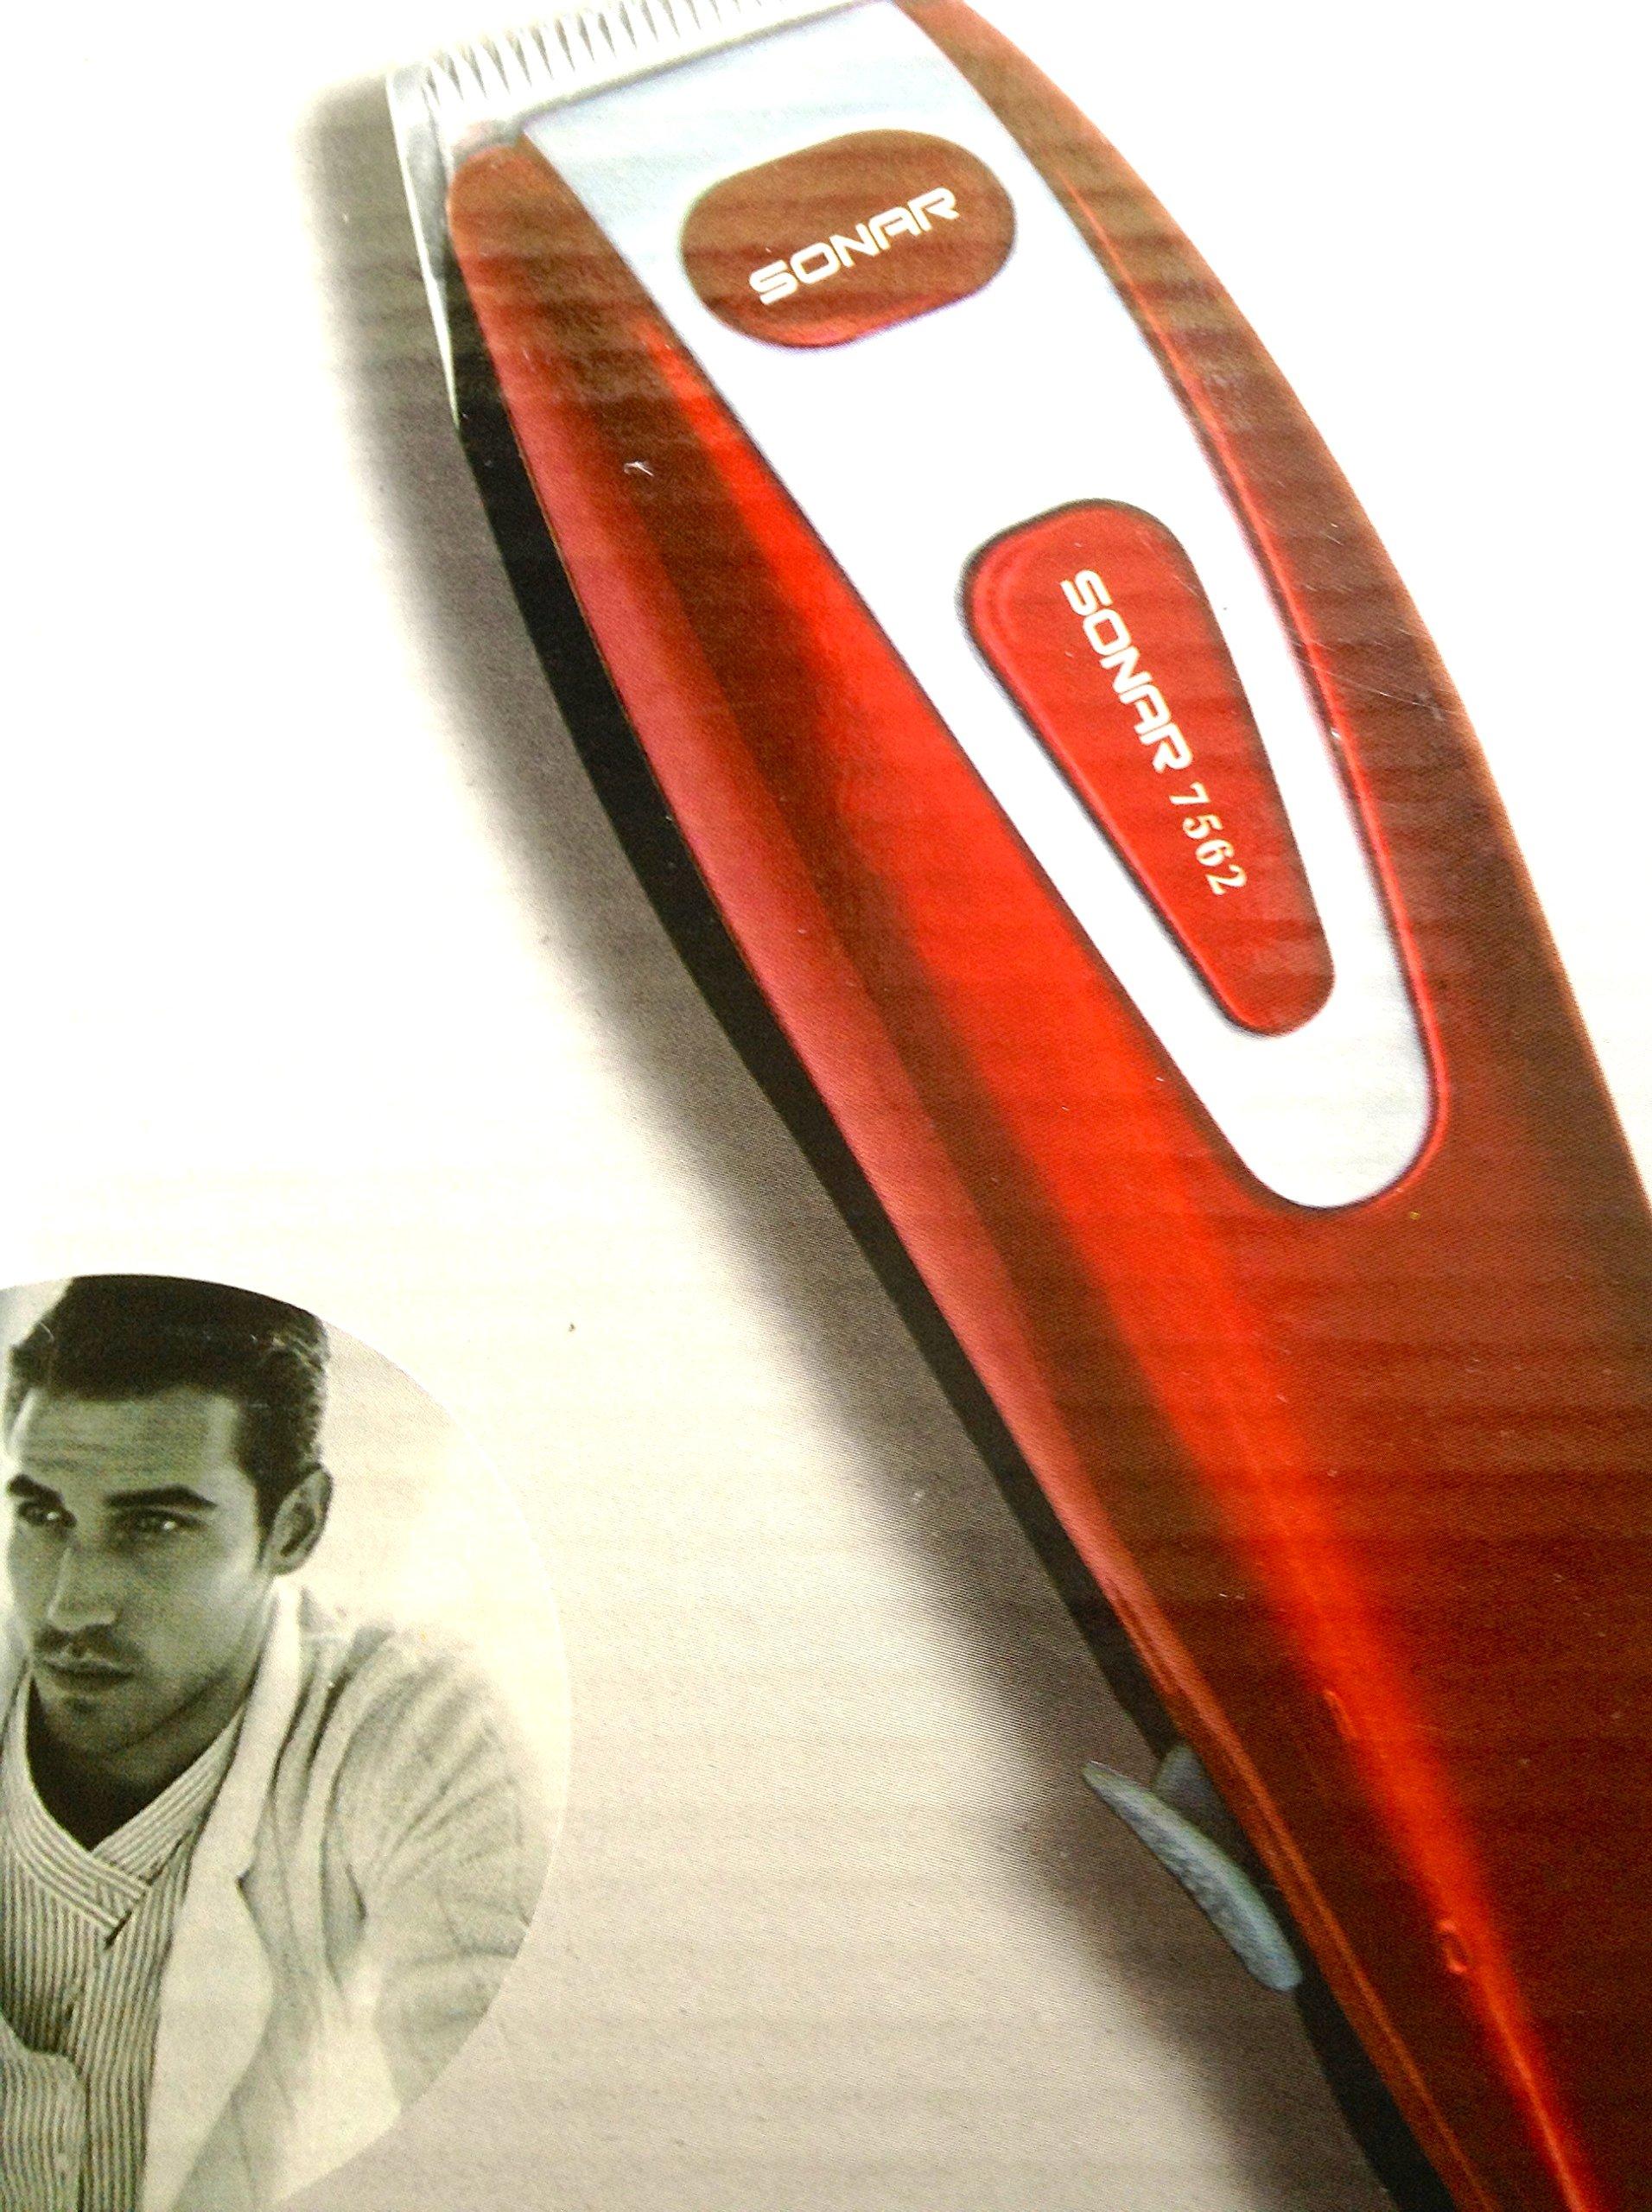 Tagliacapelli Regolacapelli Sonar PROFESSIONAL HAIR CLIPPER BEARD & body TRIMMER - Ideale per Parucc